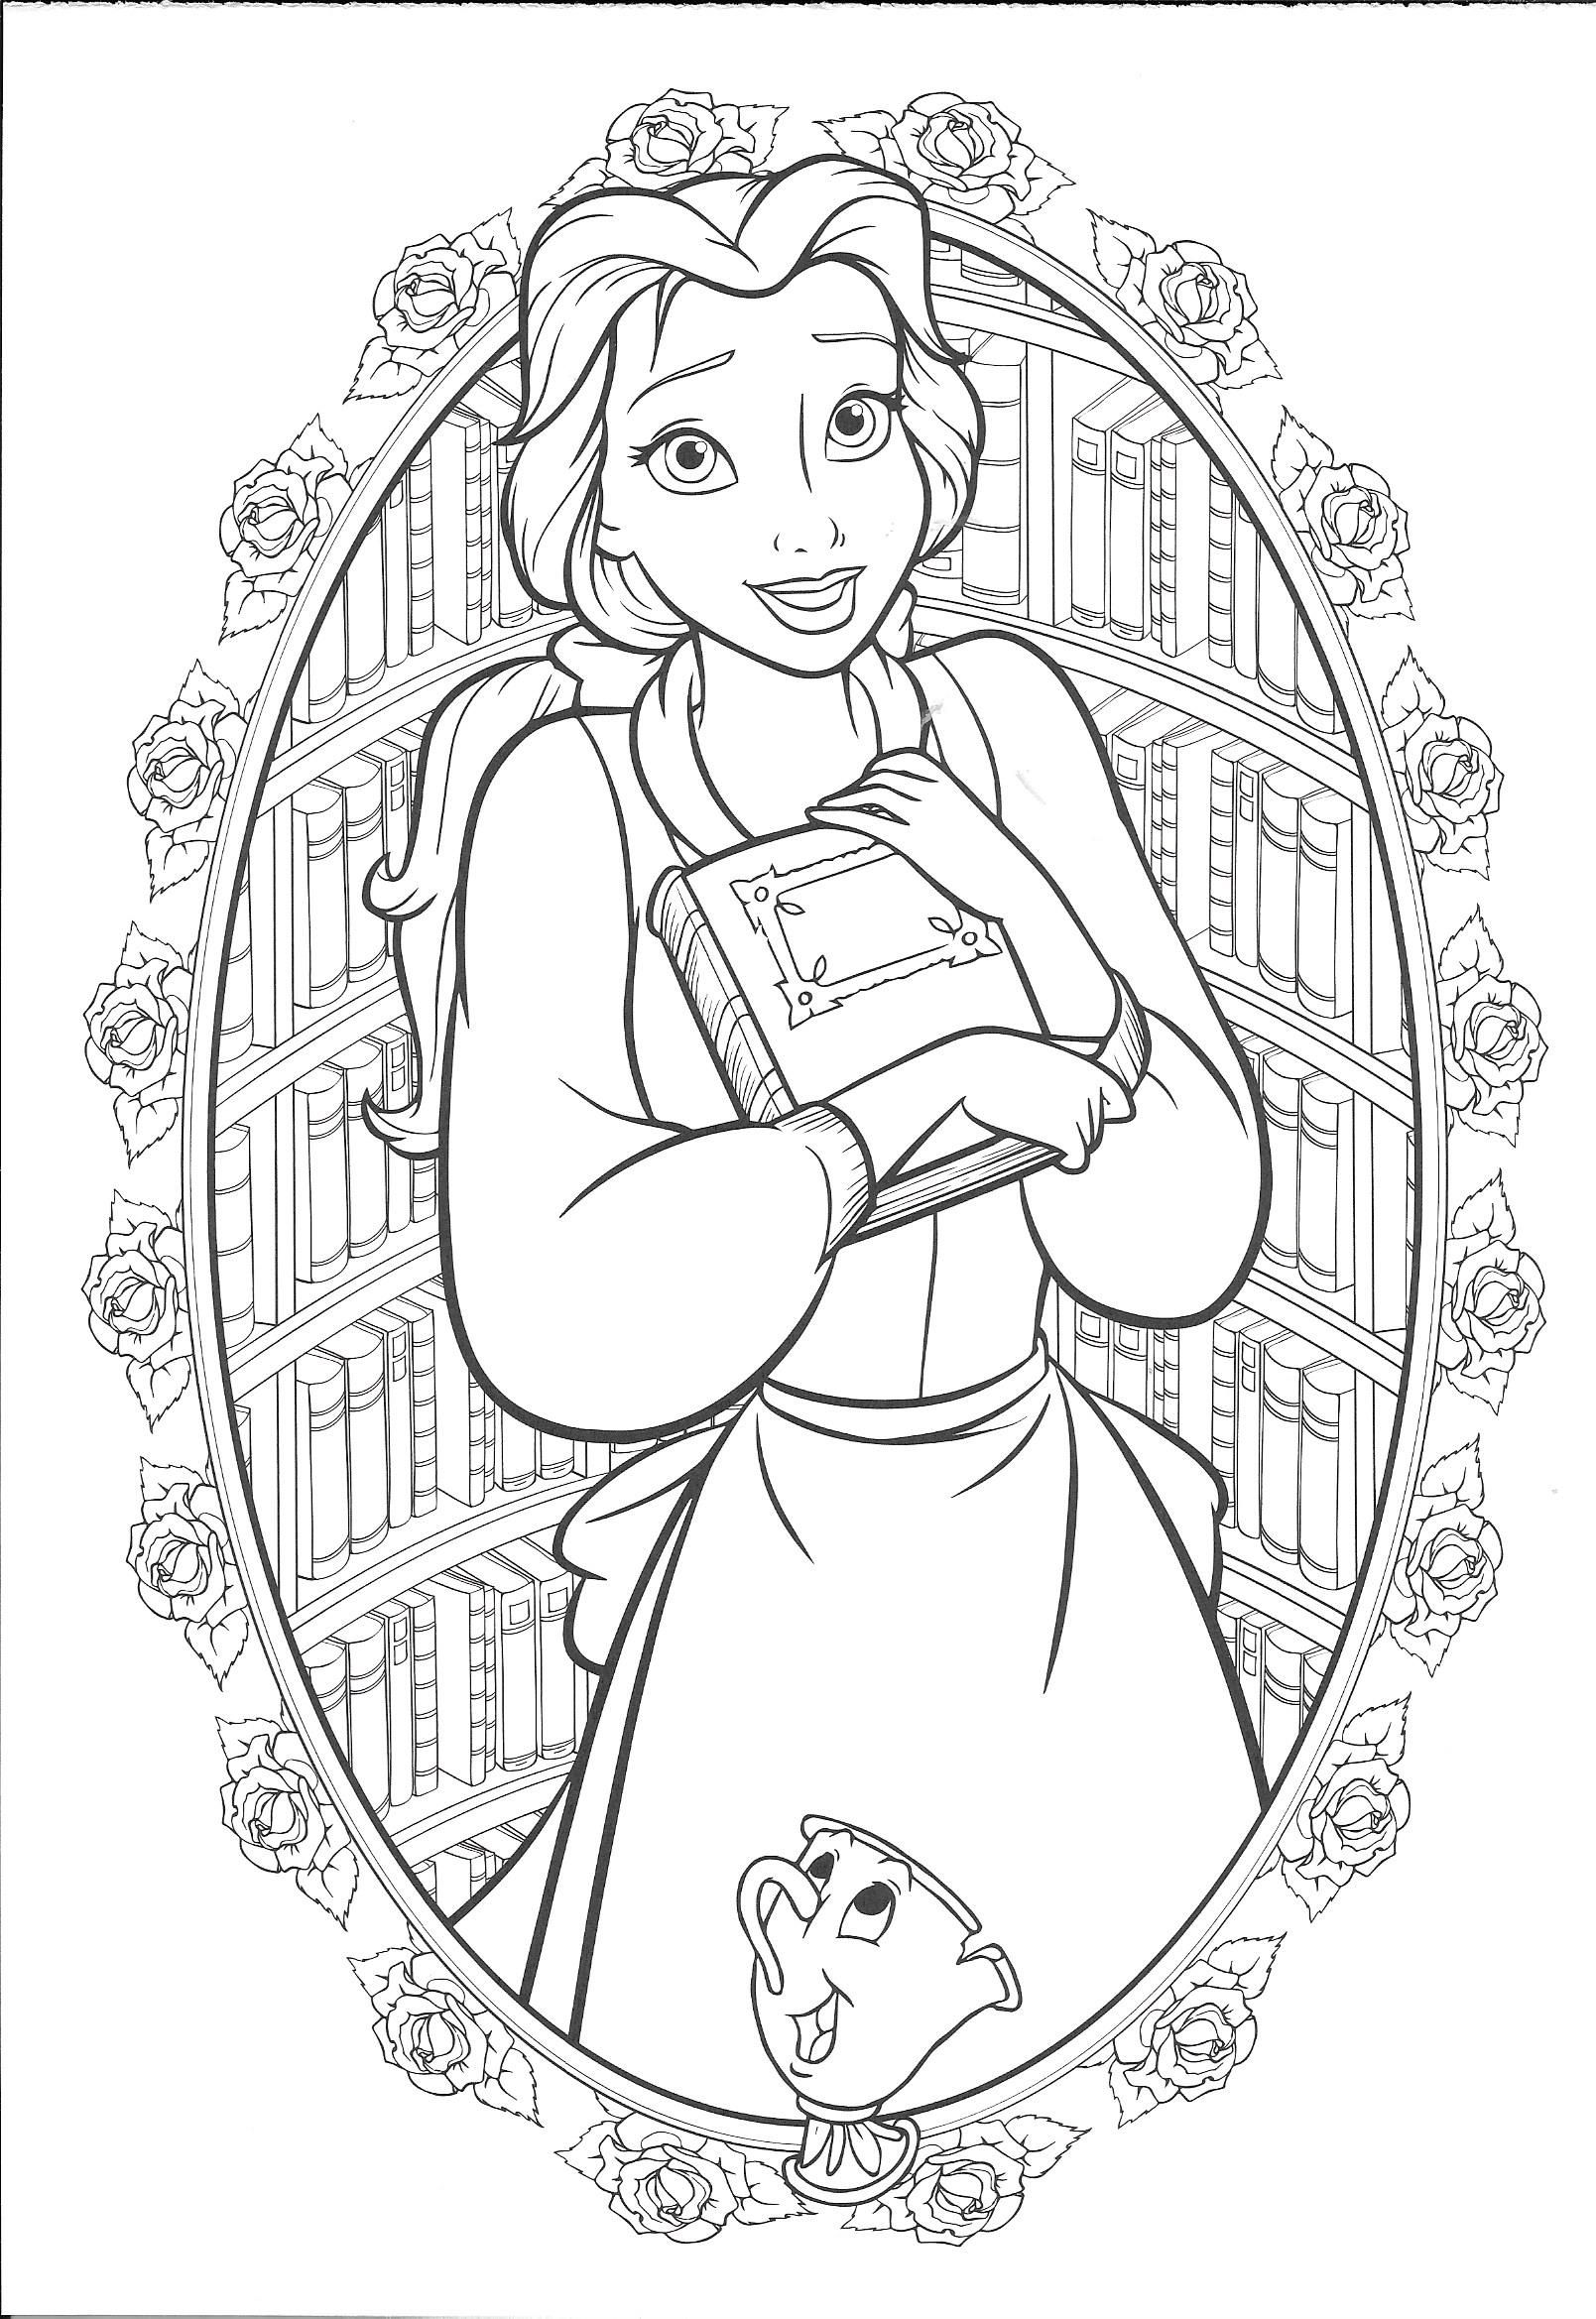 Belle The Bookworm Disney Coloring Pages Belle Coloring Pages Coloring Pages